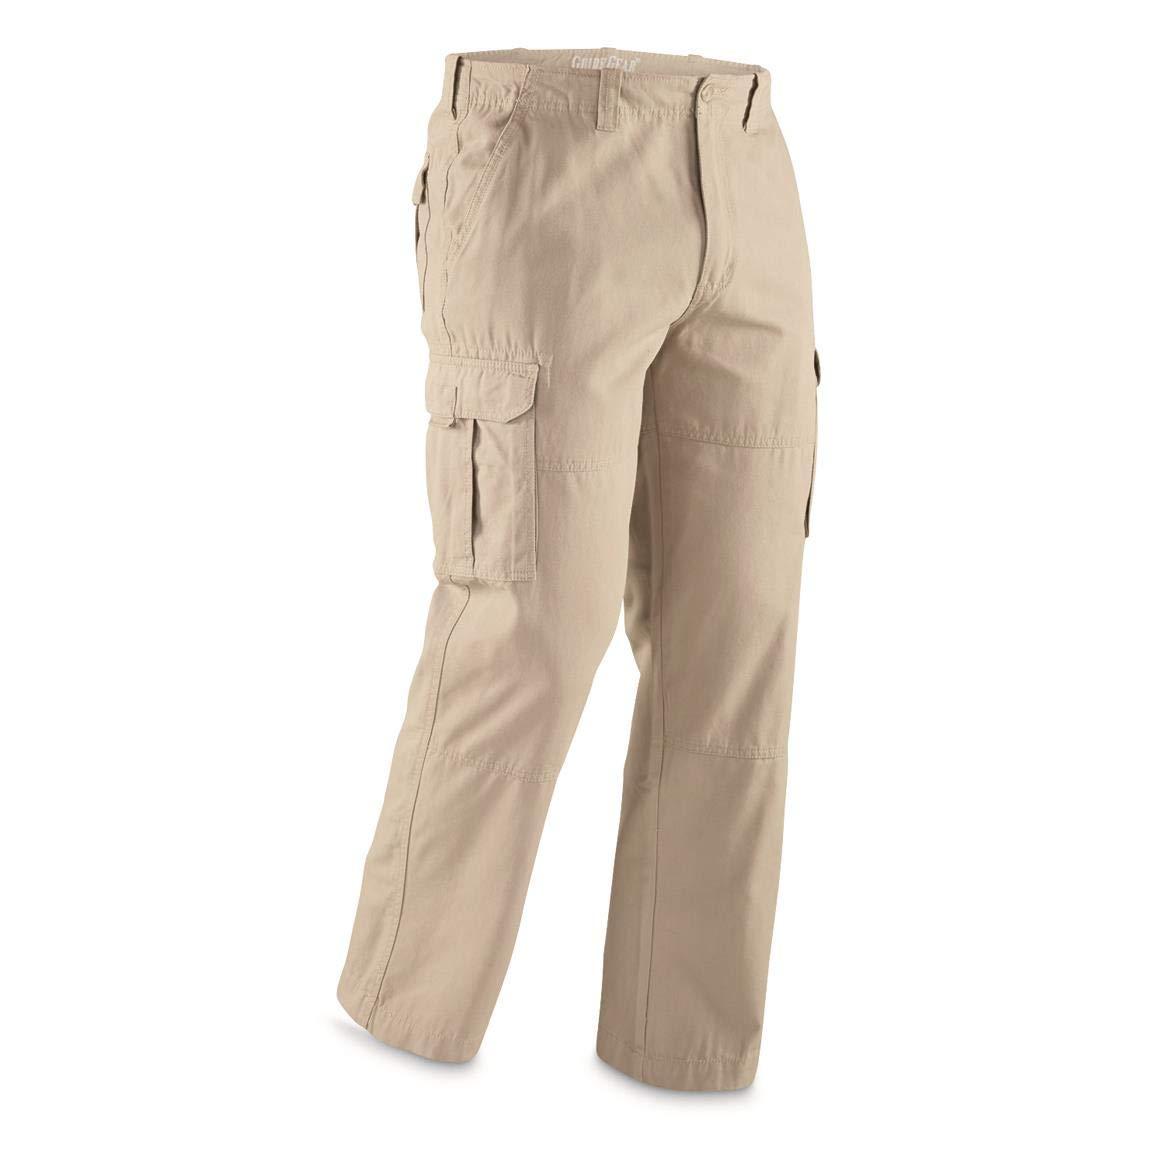 Guide Gear Mens Outdoor Cargo Pants